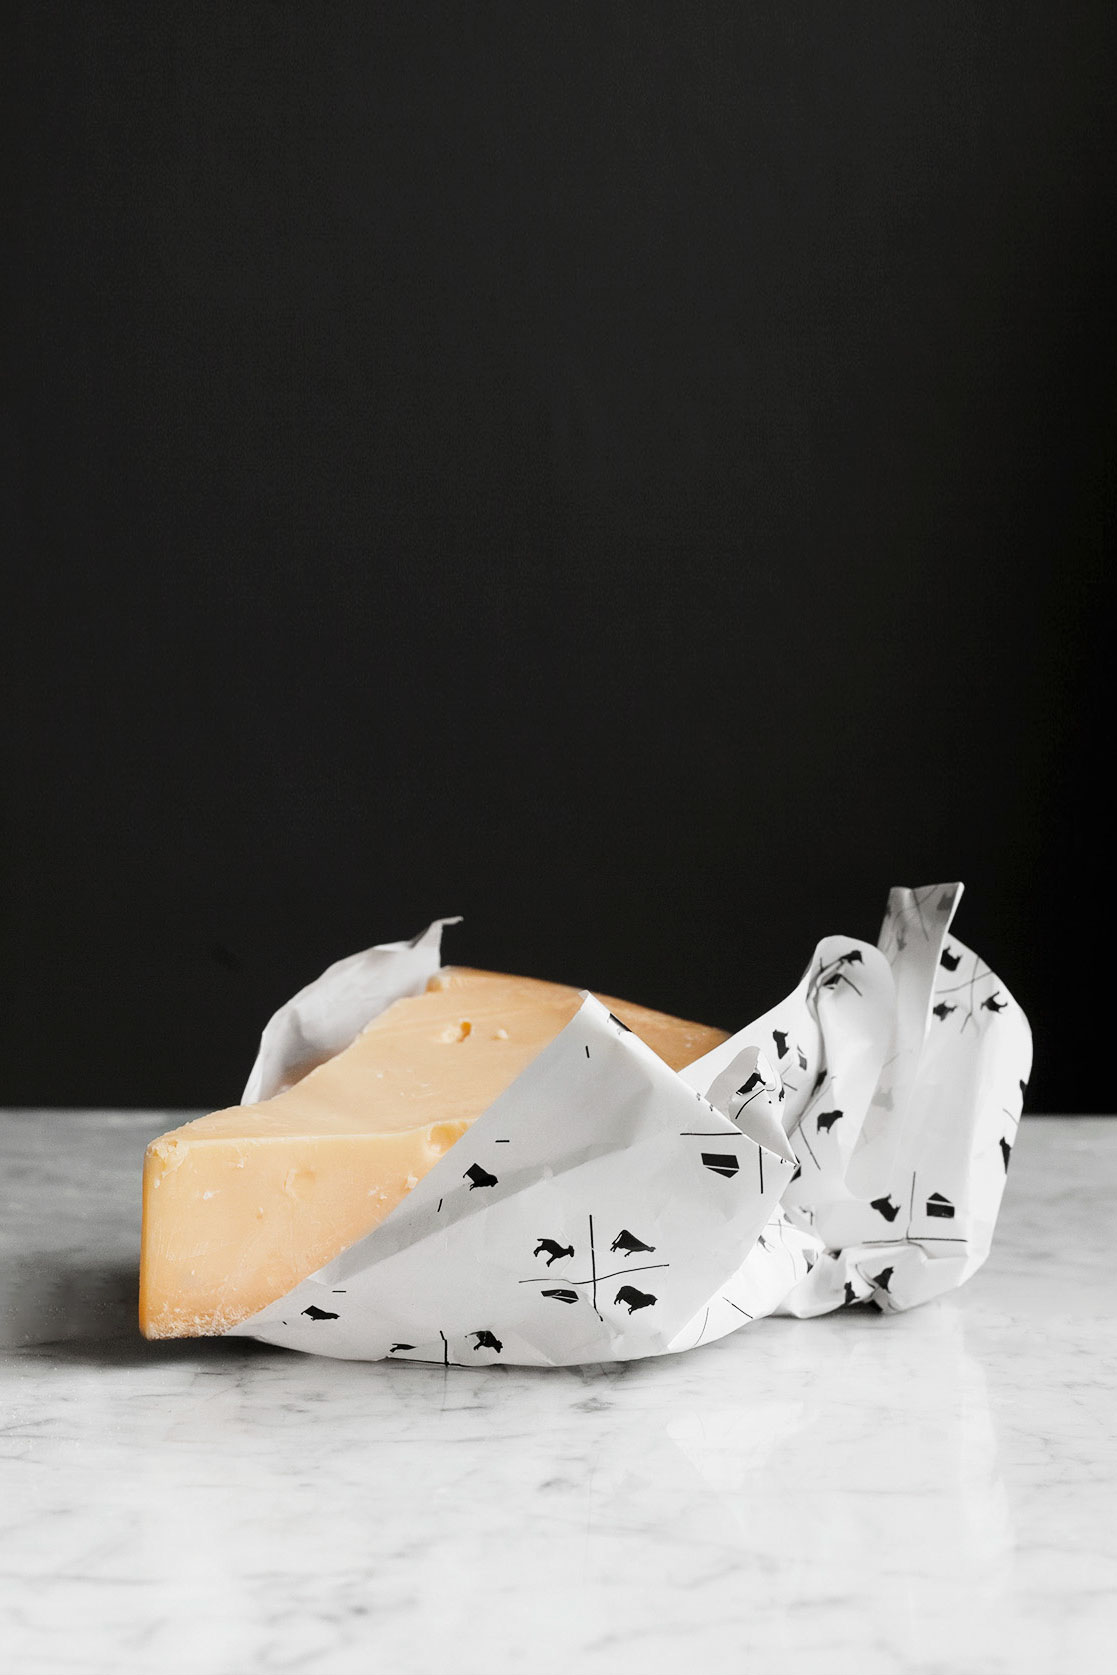 Ostpapper Cheese Paper